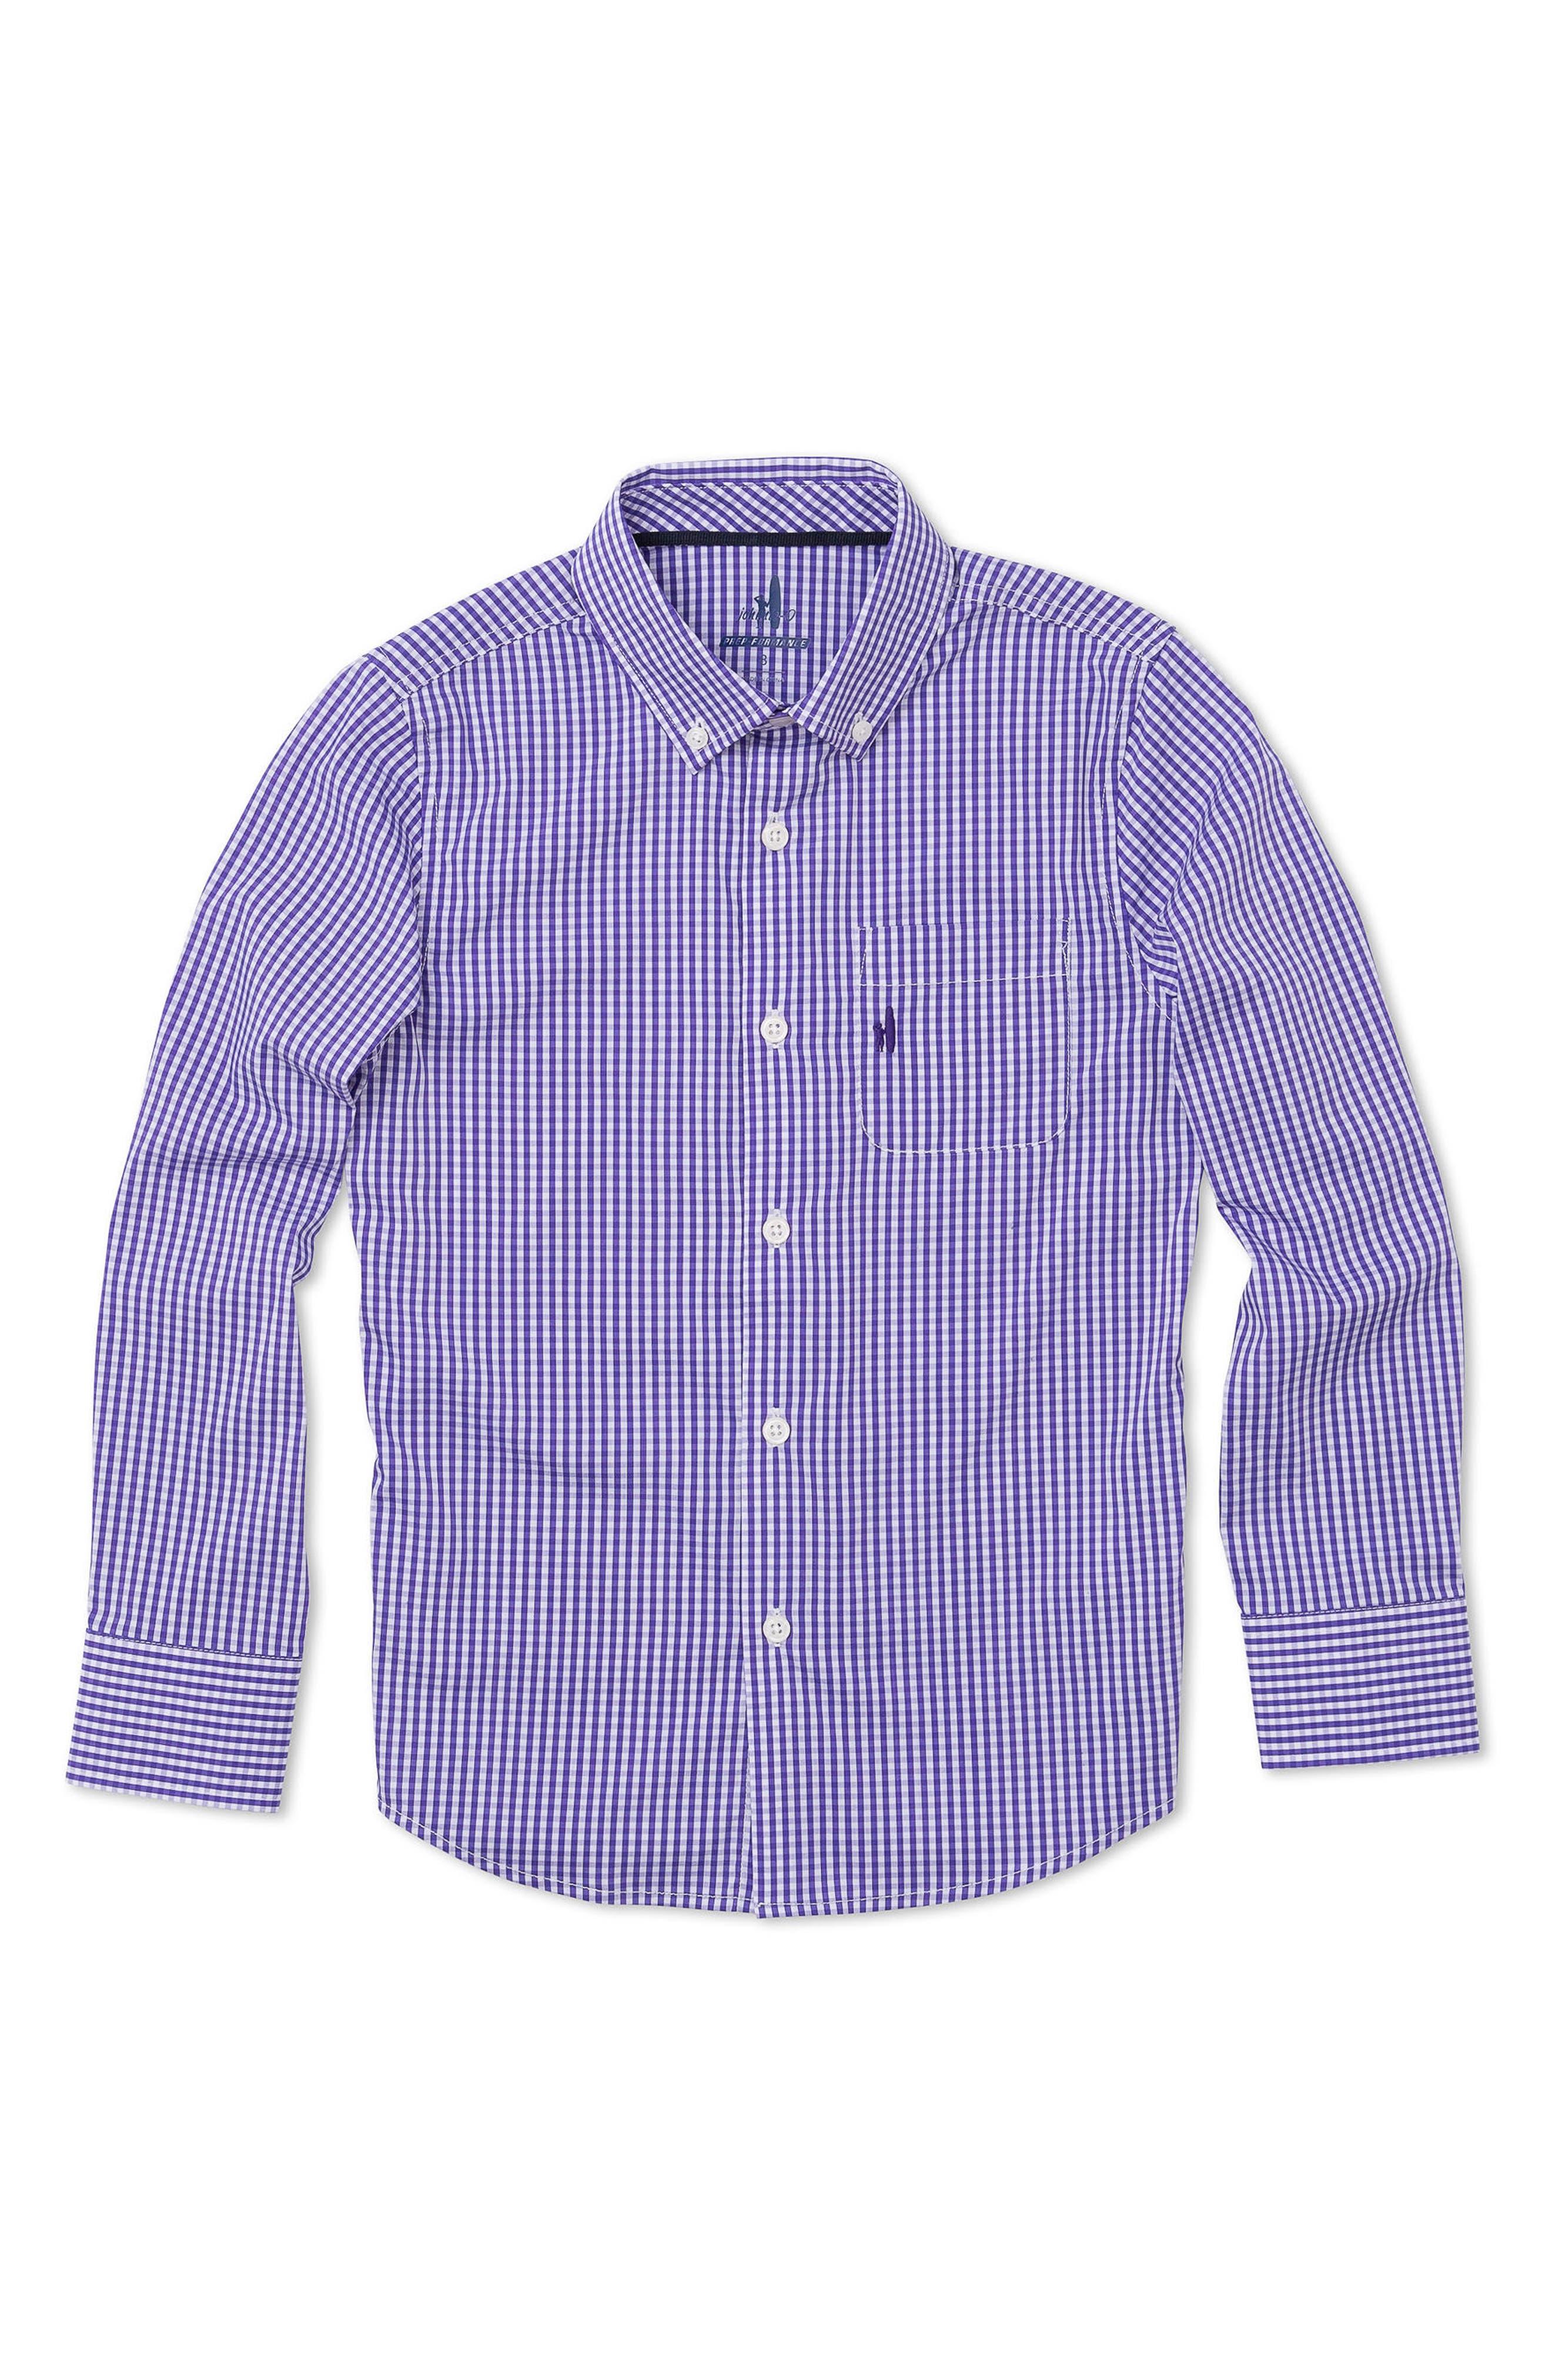 Johnnie-O Augusta Jr. Gingham Dress Shirt (Little Boys & Big Boys)